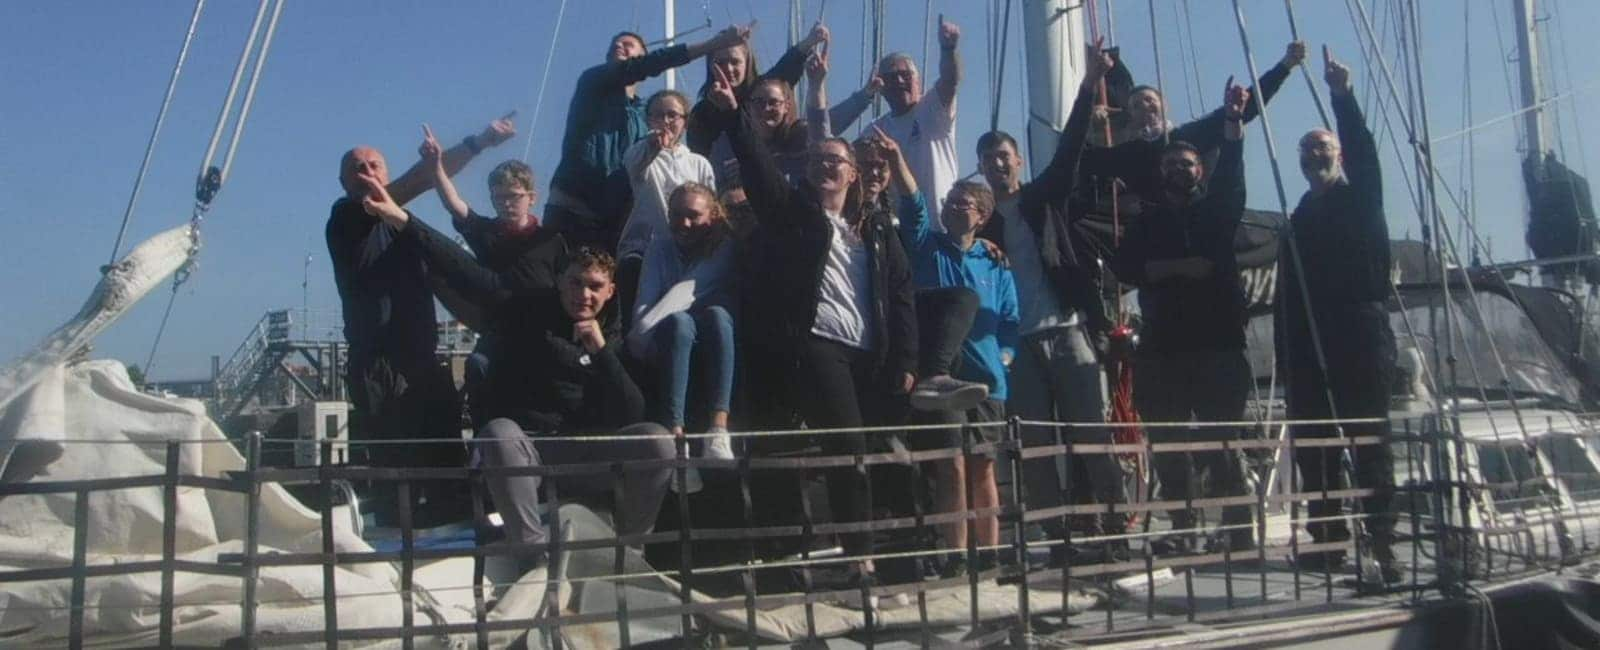 Ocean Youth Trust Scotland/Drumchapel G15 Voyage